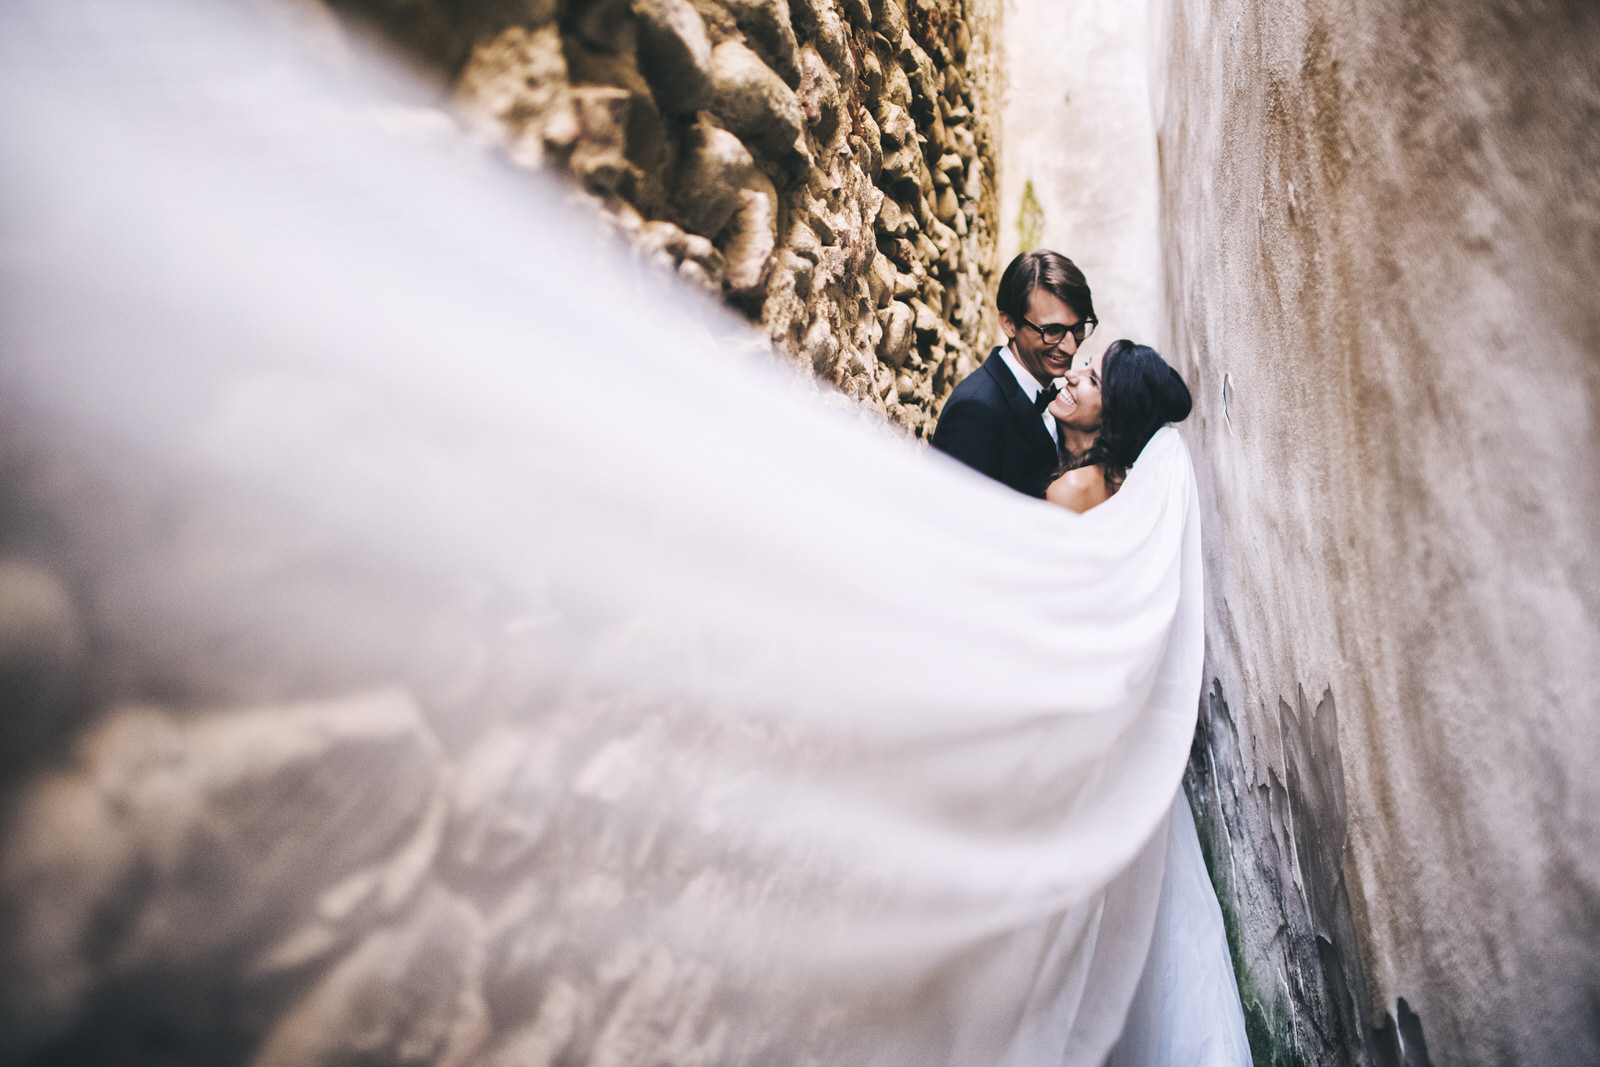 wedding photographer in italy-venice-tuscany-florence-amalfi coast-como lake-villa del balbianello-siena-amalfi-ravello-belmond-villa cimbrone24